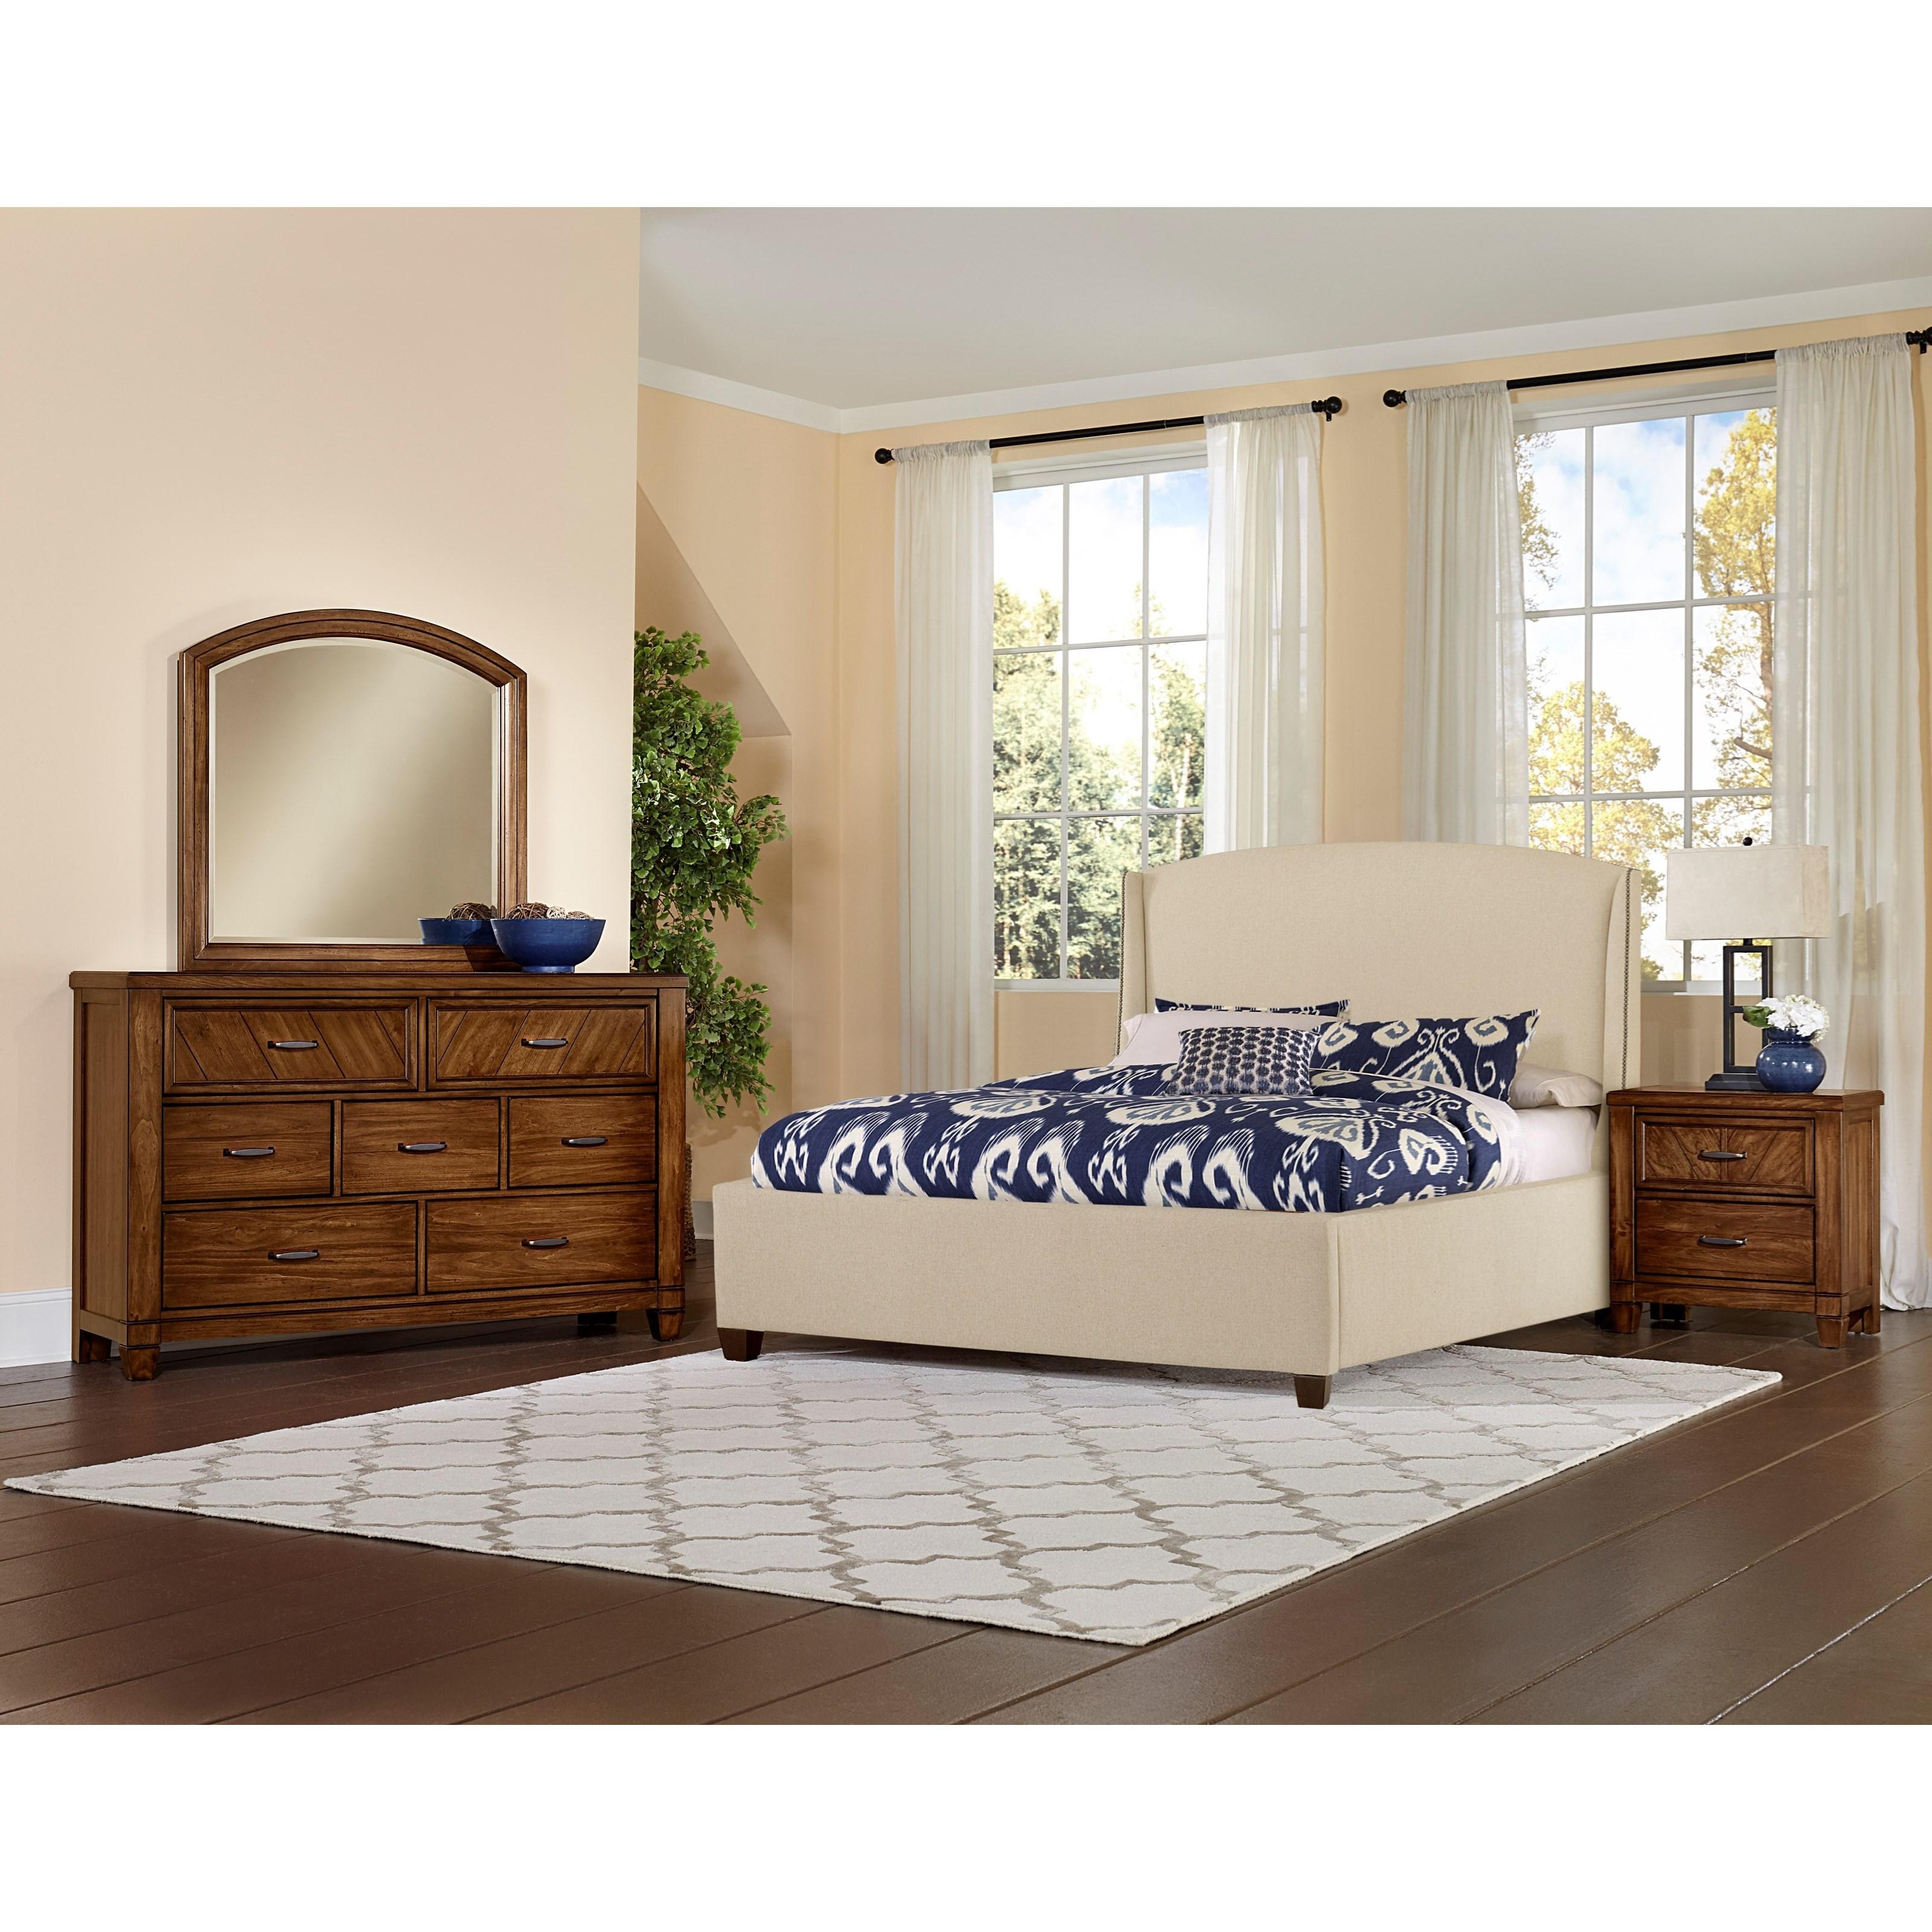 Vaughan Furniture Bedroom Sets Bedroom Colour Ideas For Teenage Girls John Deere Bedroom Furniture Bedroom Sets India: Vaughan Bassett Rustic Cottage King Bedroom Group